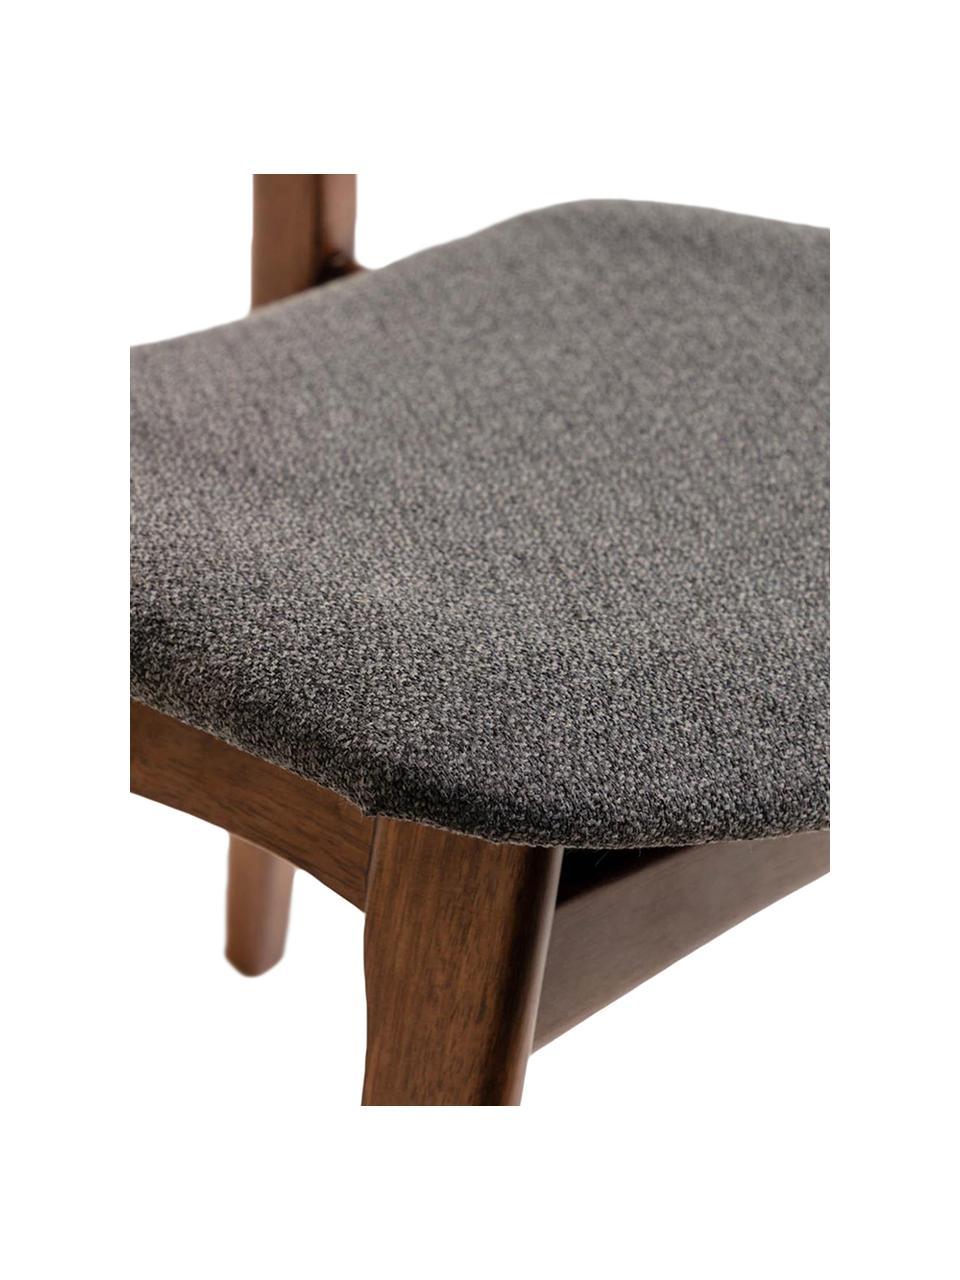 Holzstühle Selia, 2 Stück, Gestell: Massives Gummibaumholz, W, Bezug: Polyester, Dunkelgrau, Dunkelbraun, 48 x 79 cm